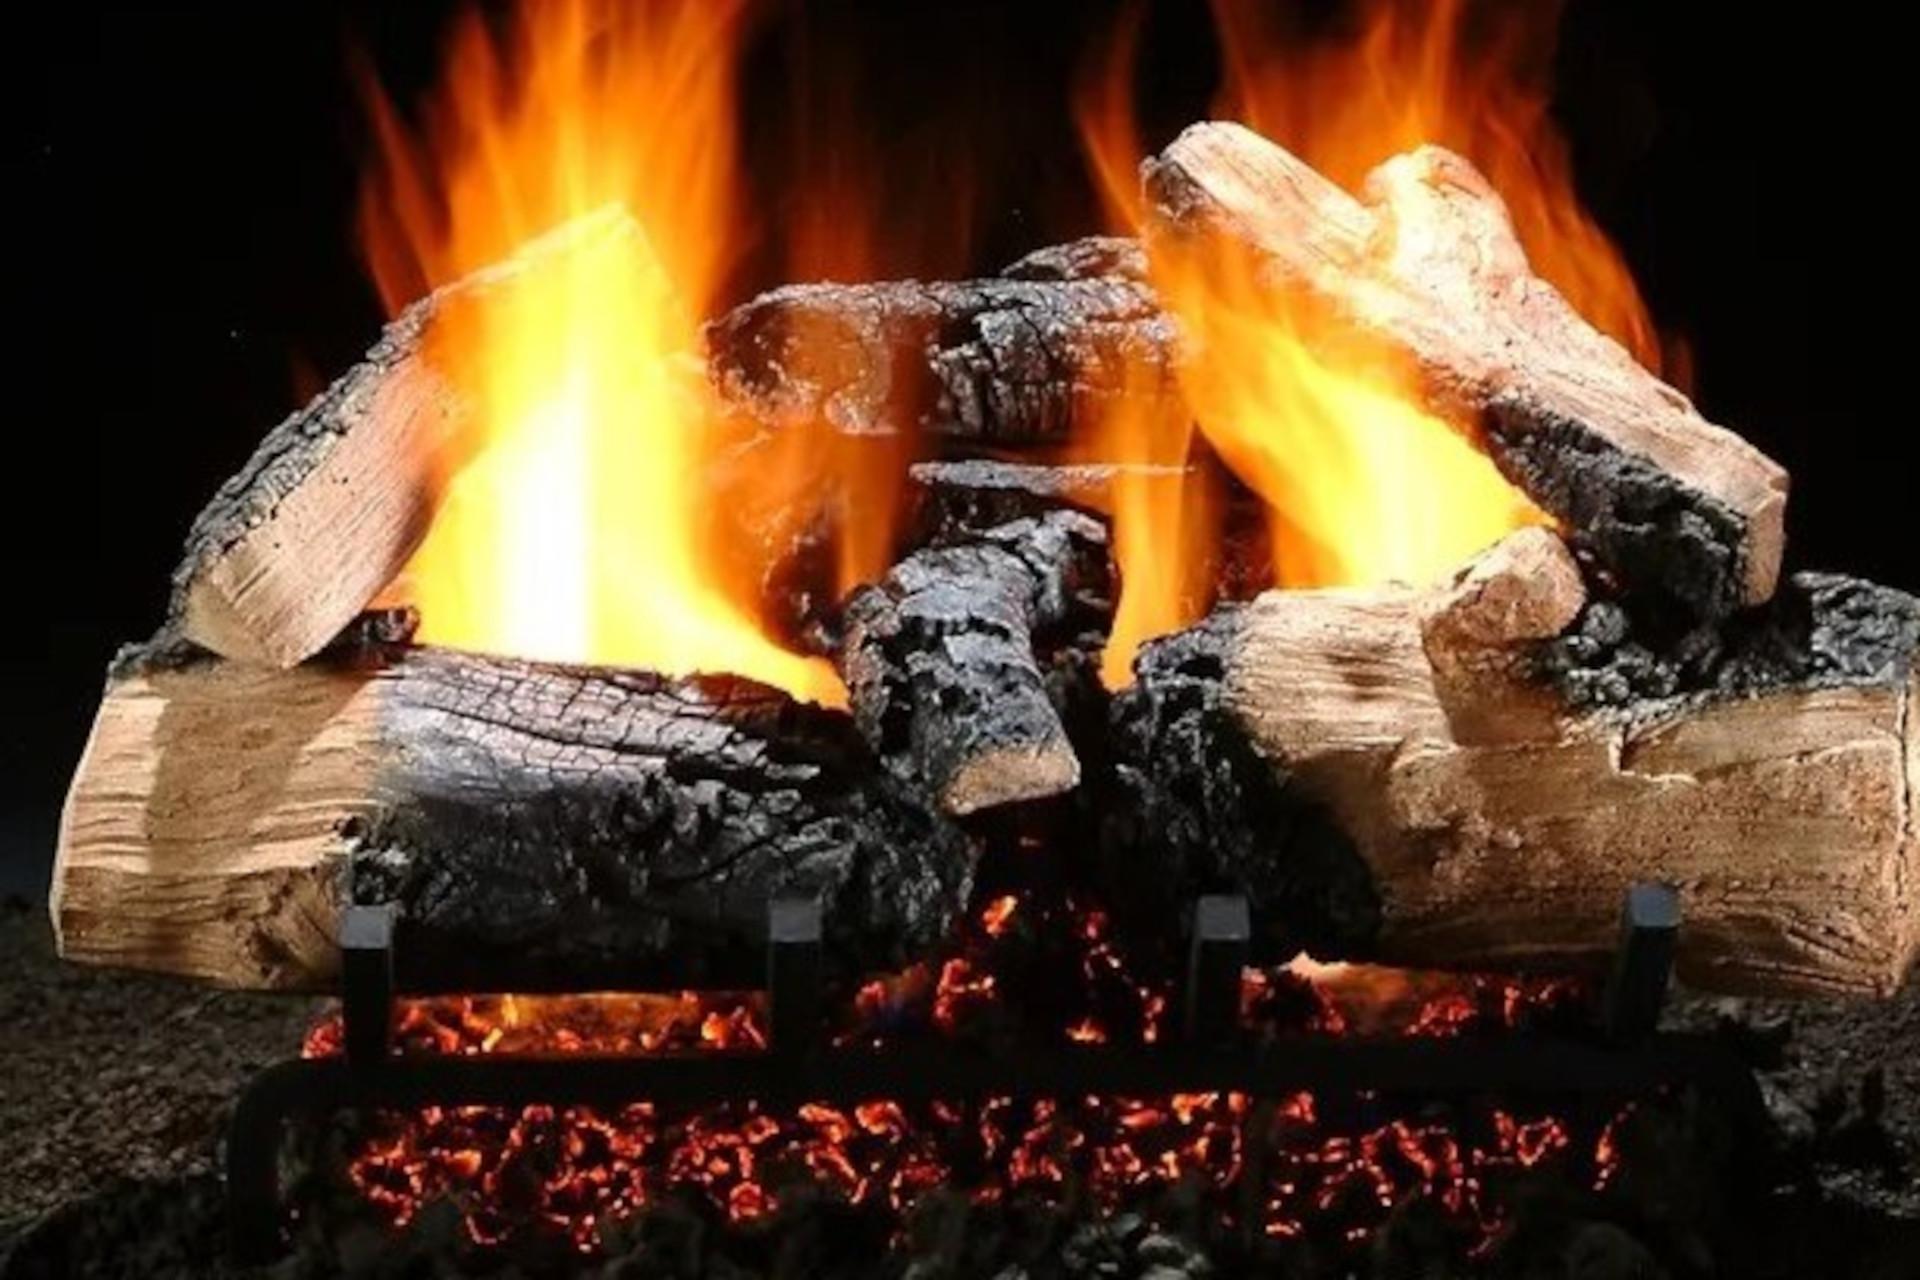 Hargrove Twilight Inferno Vented Gas Log Set